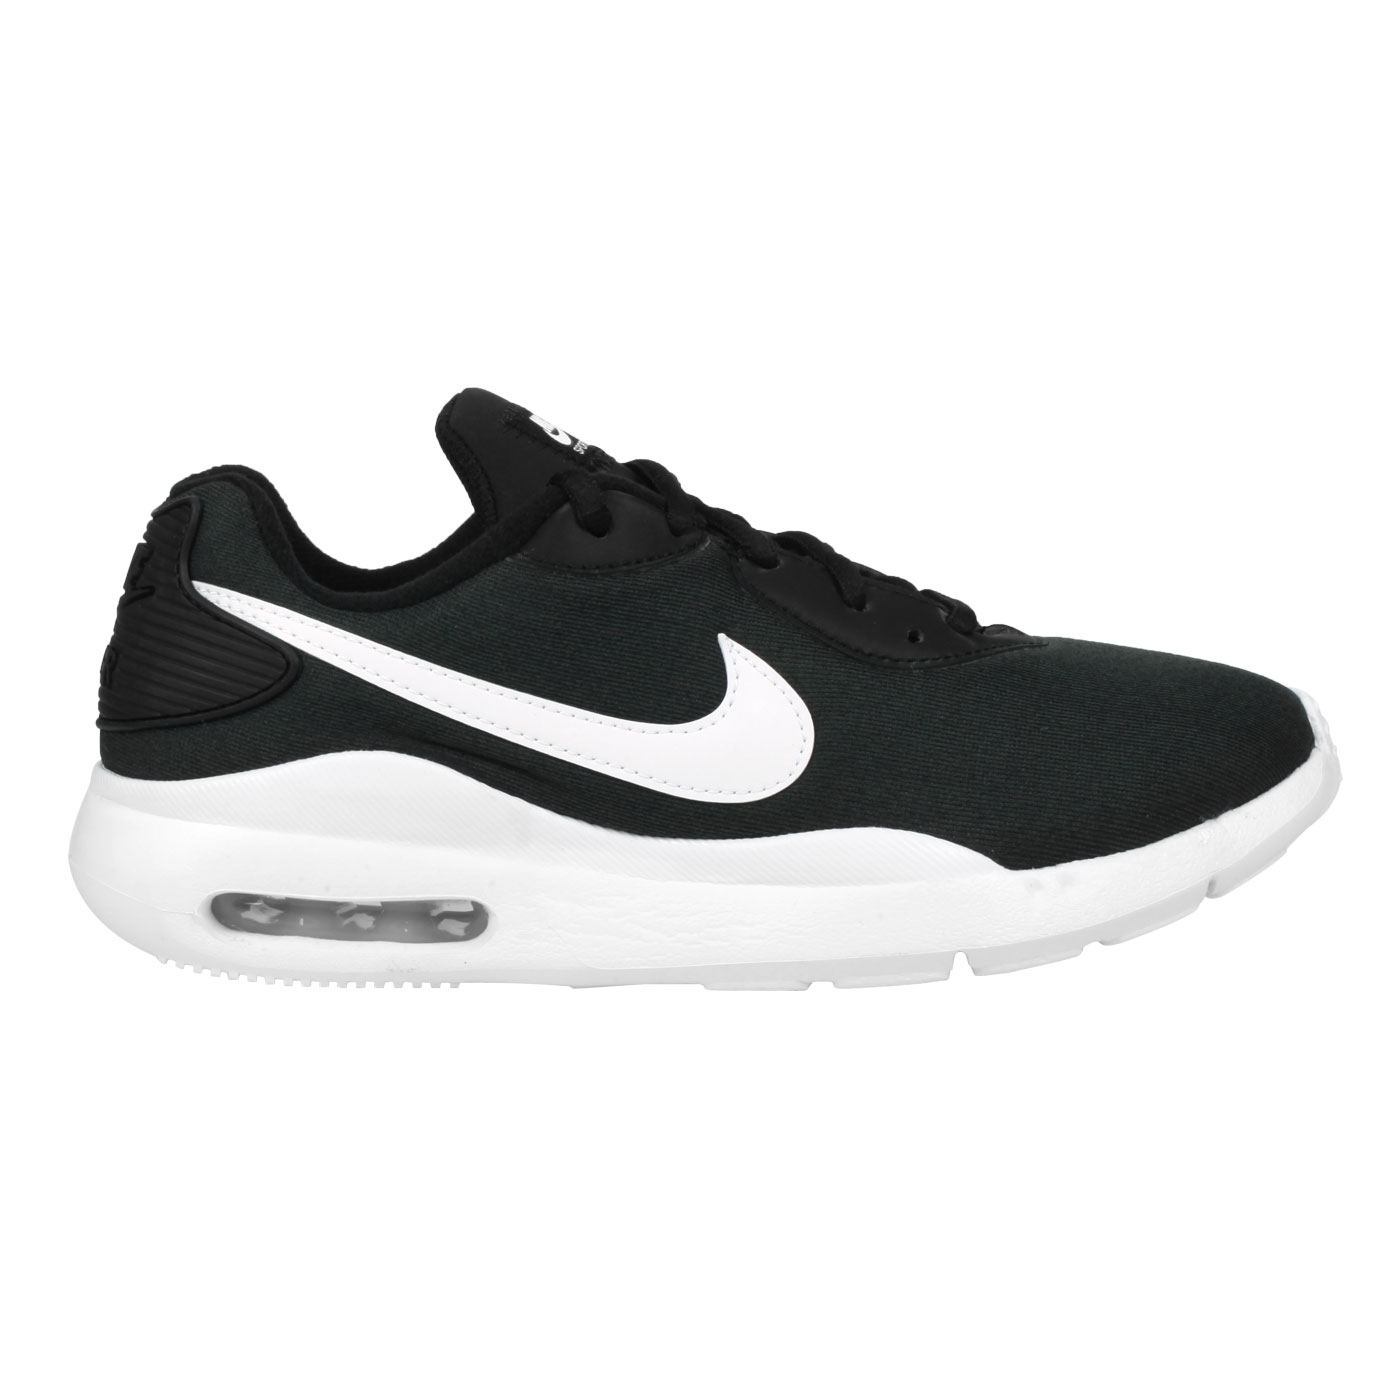 NIKE 女款休閒慢跑鞋  @WMNS  AIR MAX OKETO WNTR@CD5449001